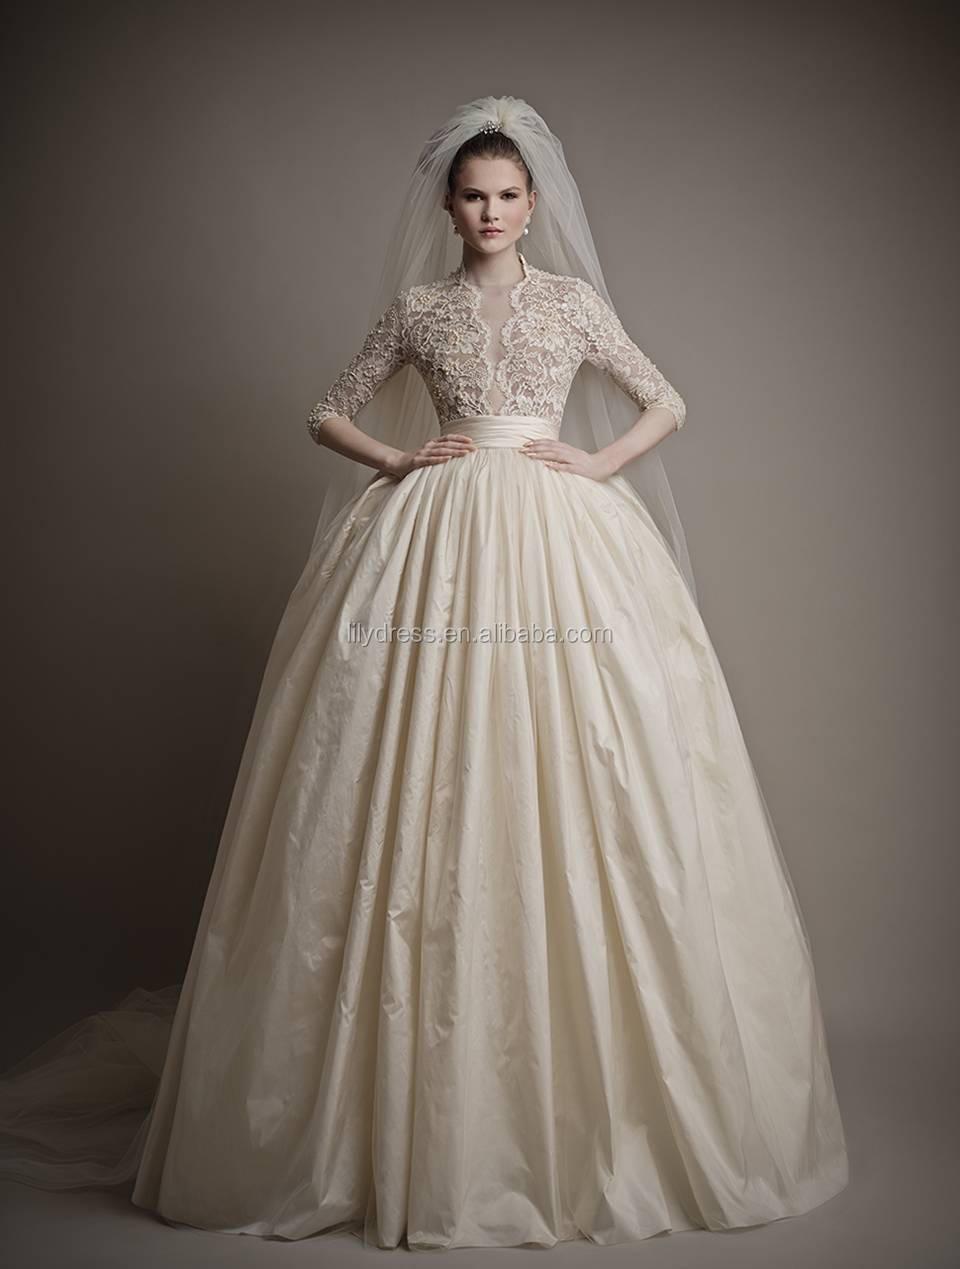 Robes de mariée arizona